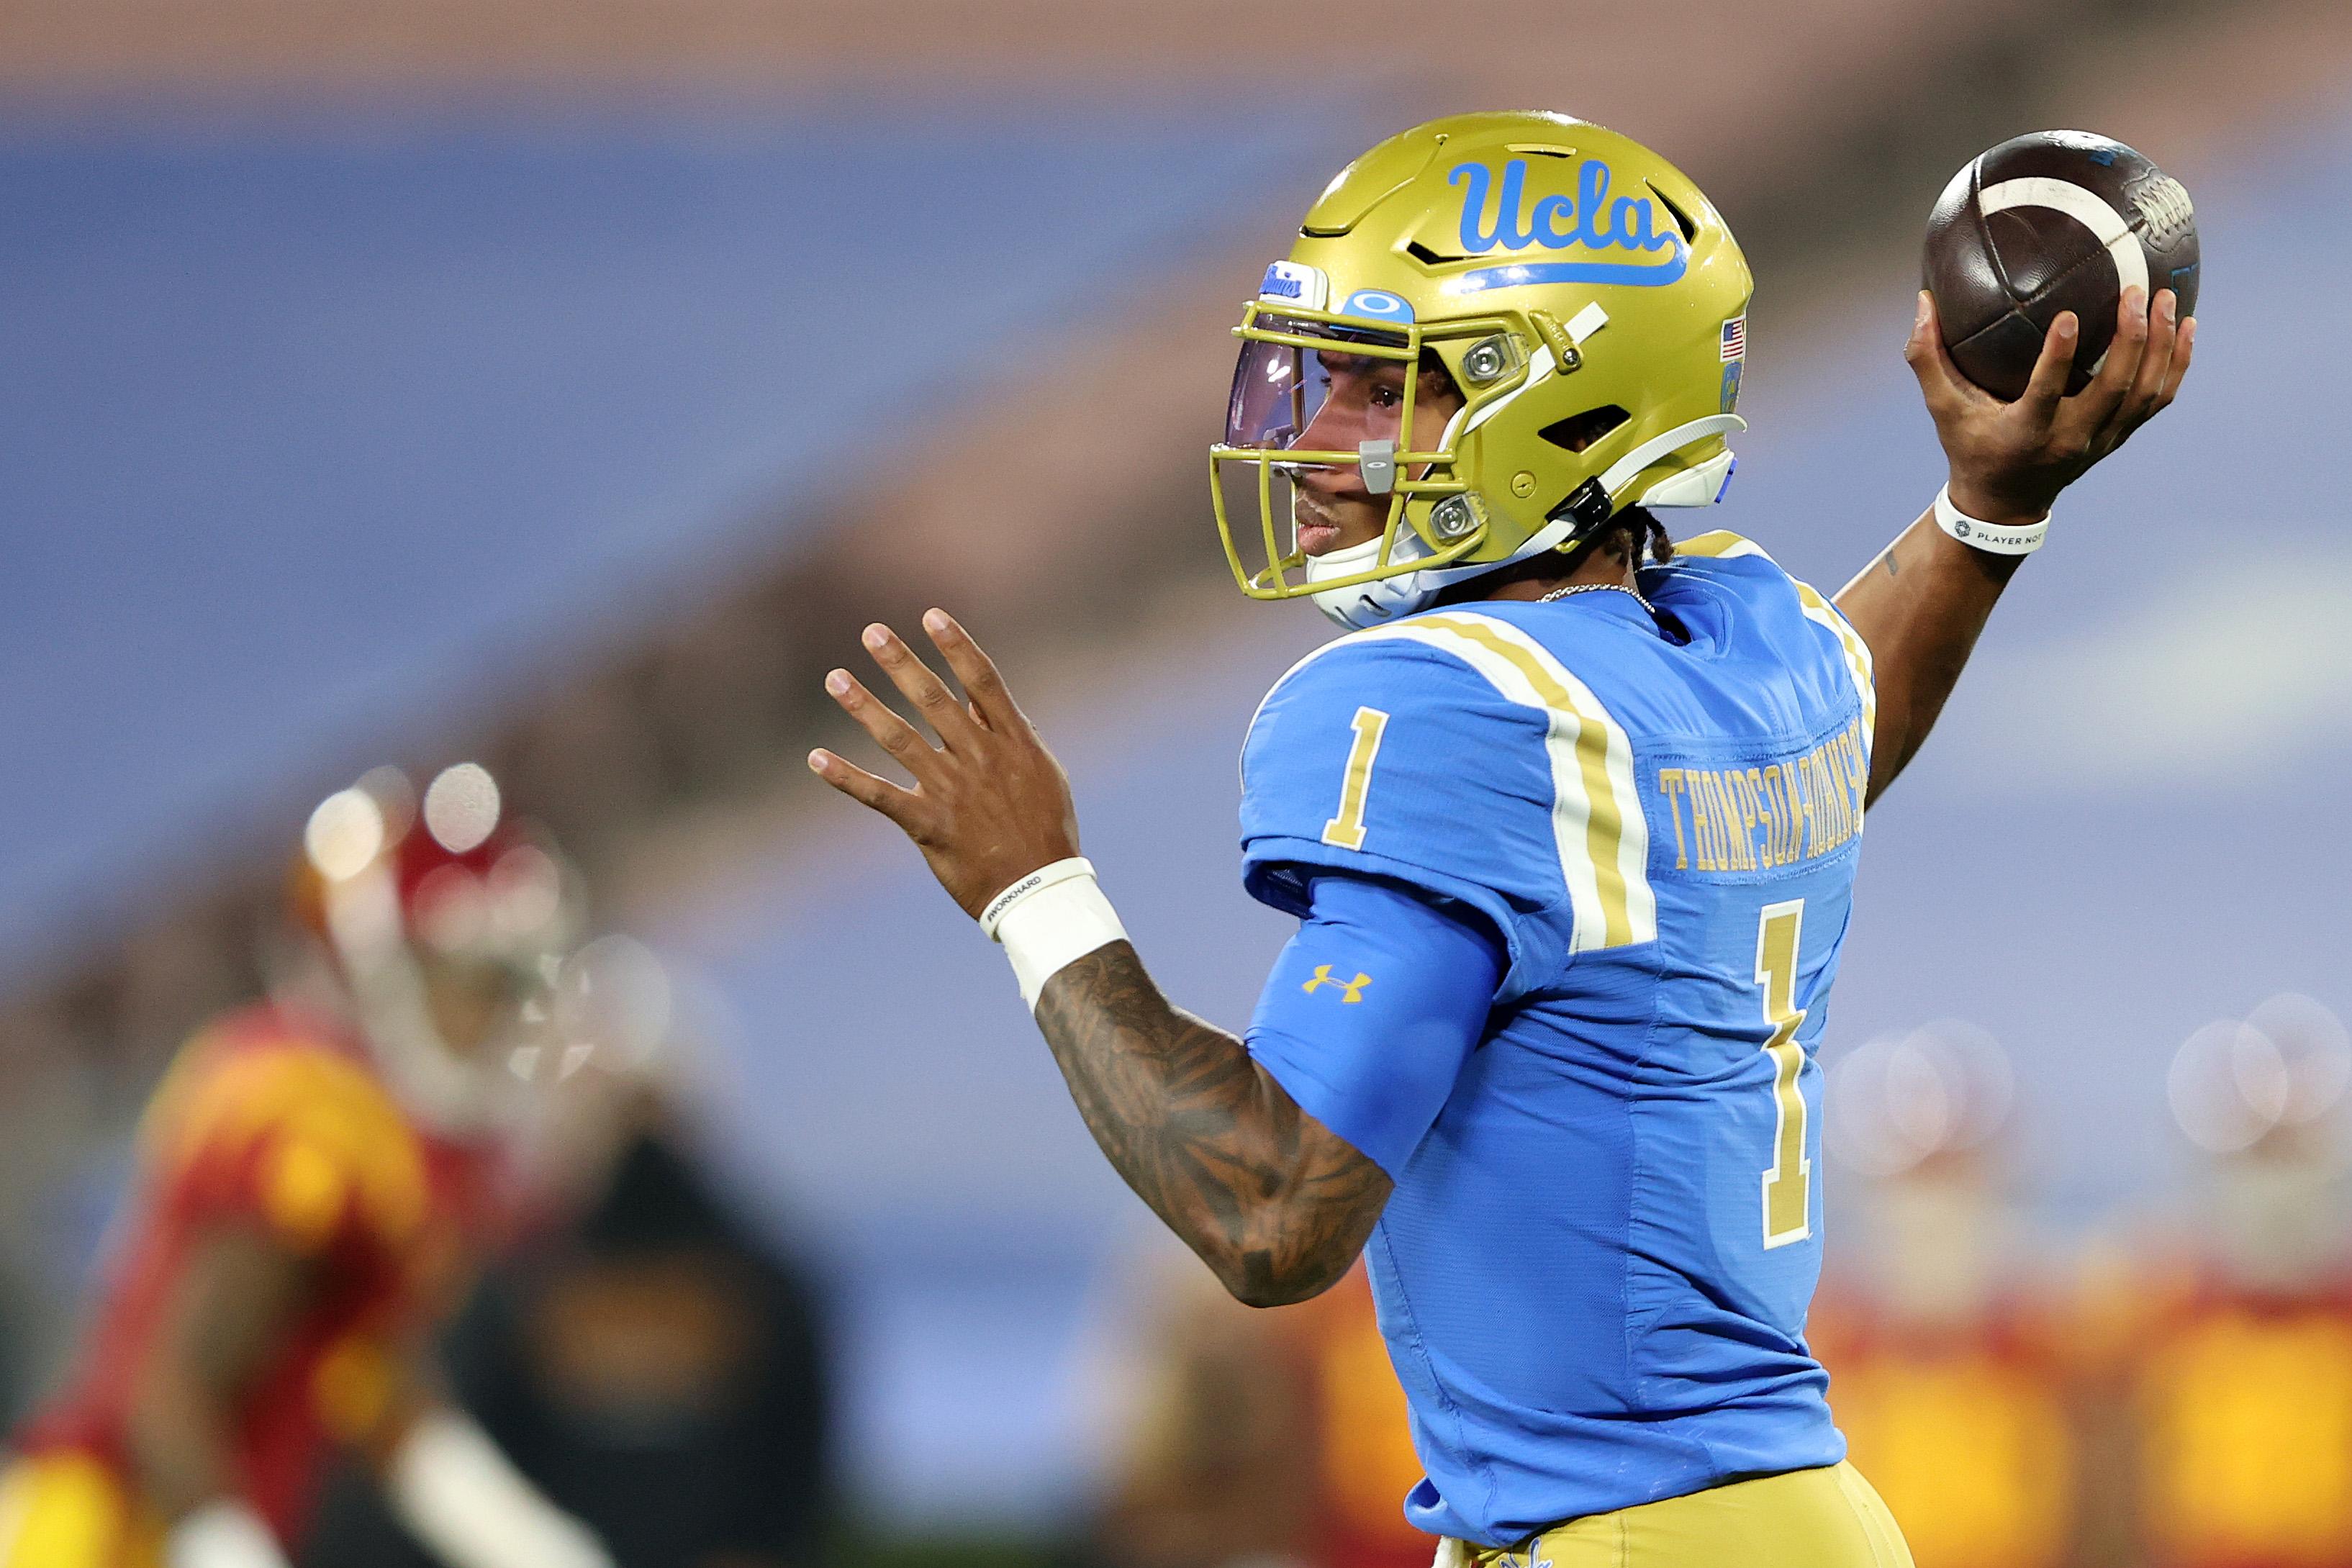 USC v UCLA